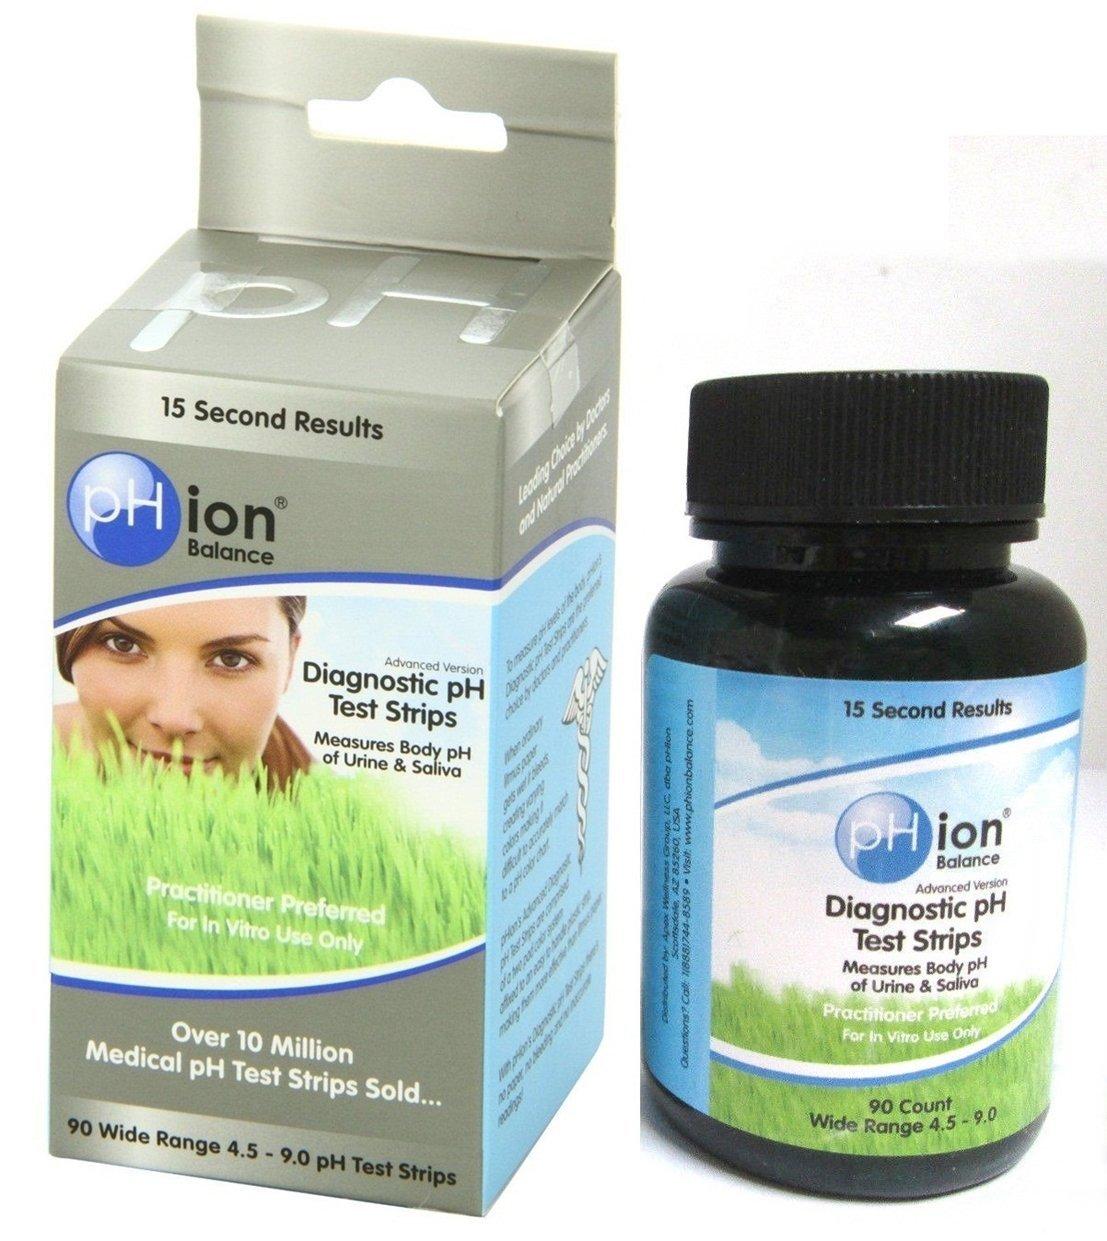 90-Count Paradisiacal Popular pH Balance Test Strips Diagnostic Kit Urine and Saliva Sensitive Check 4.5-9.0 Wide Range